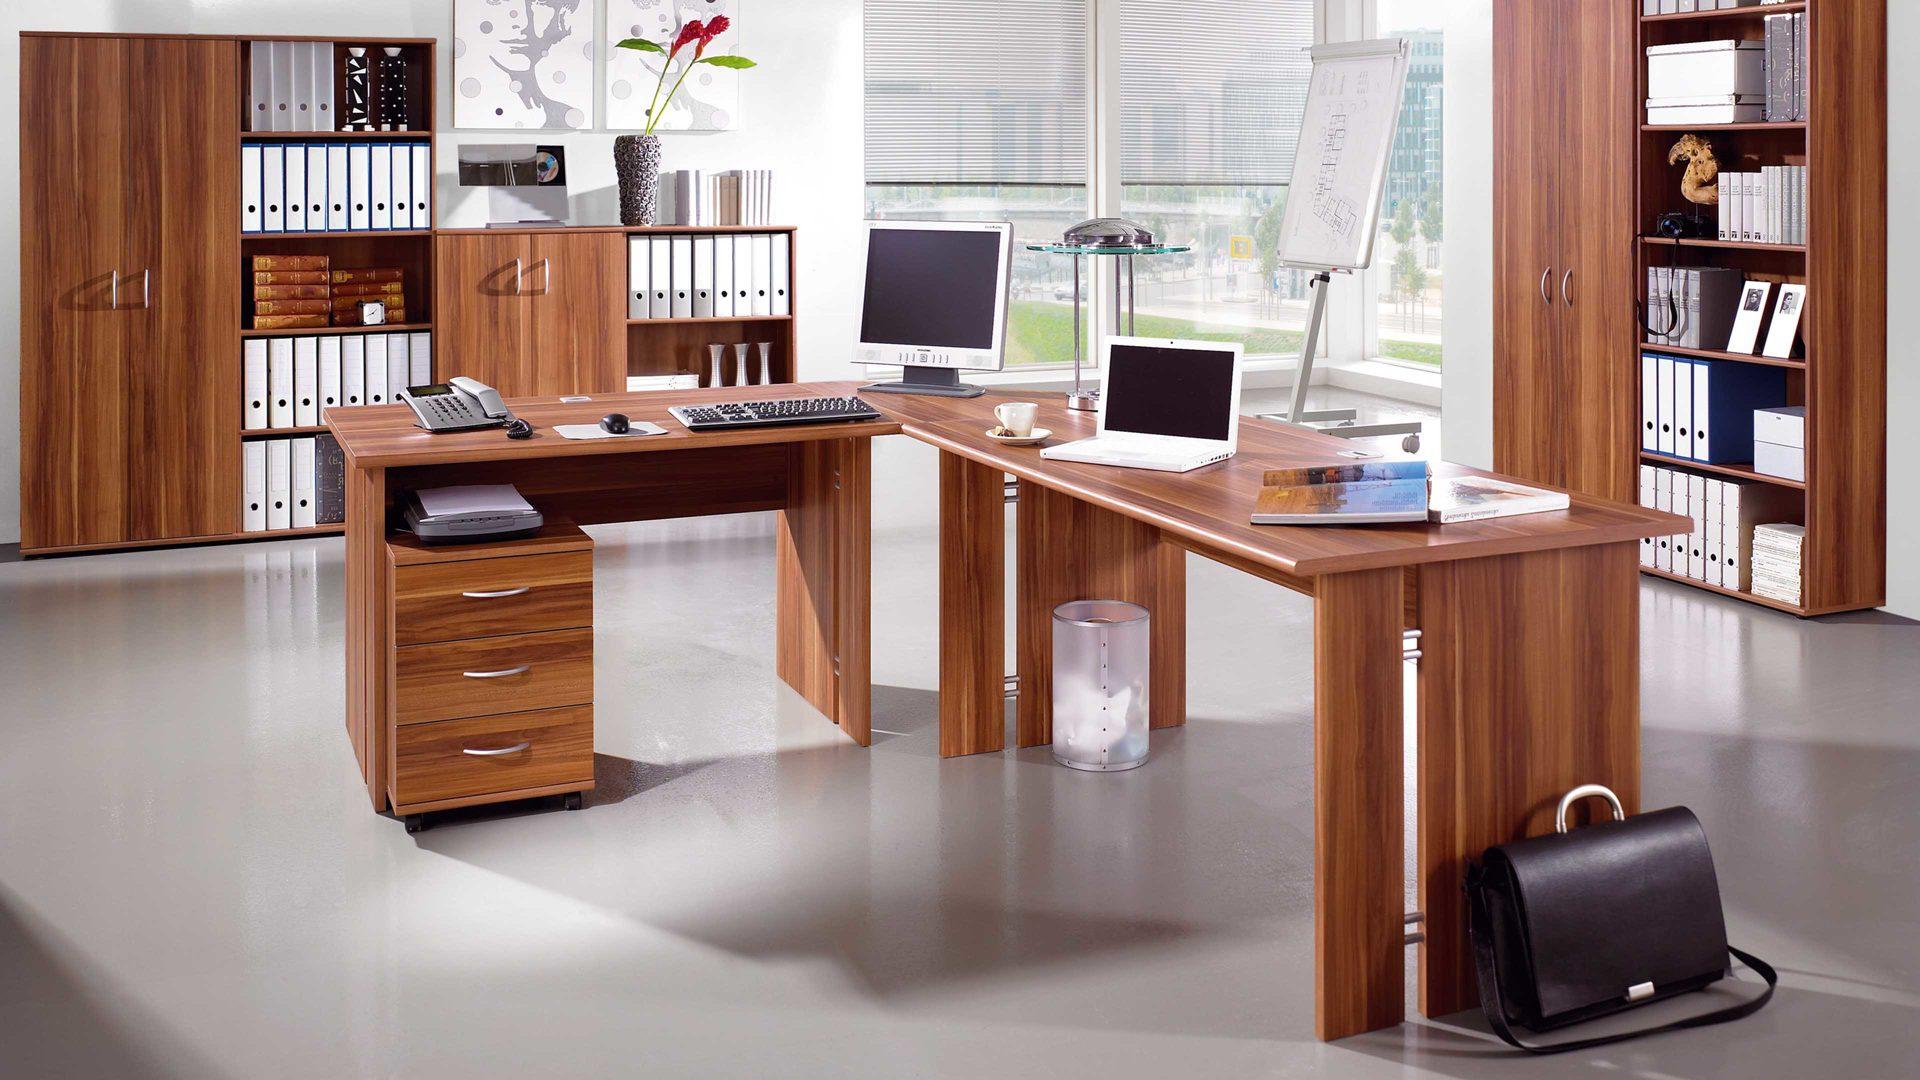 Möbel Boer Coesfeld | Räume | Arbeitszimmer | Regale + Raumteiler ...